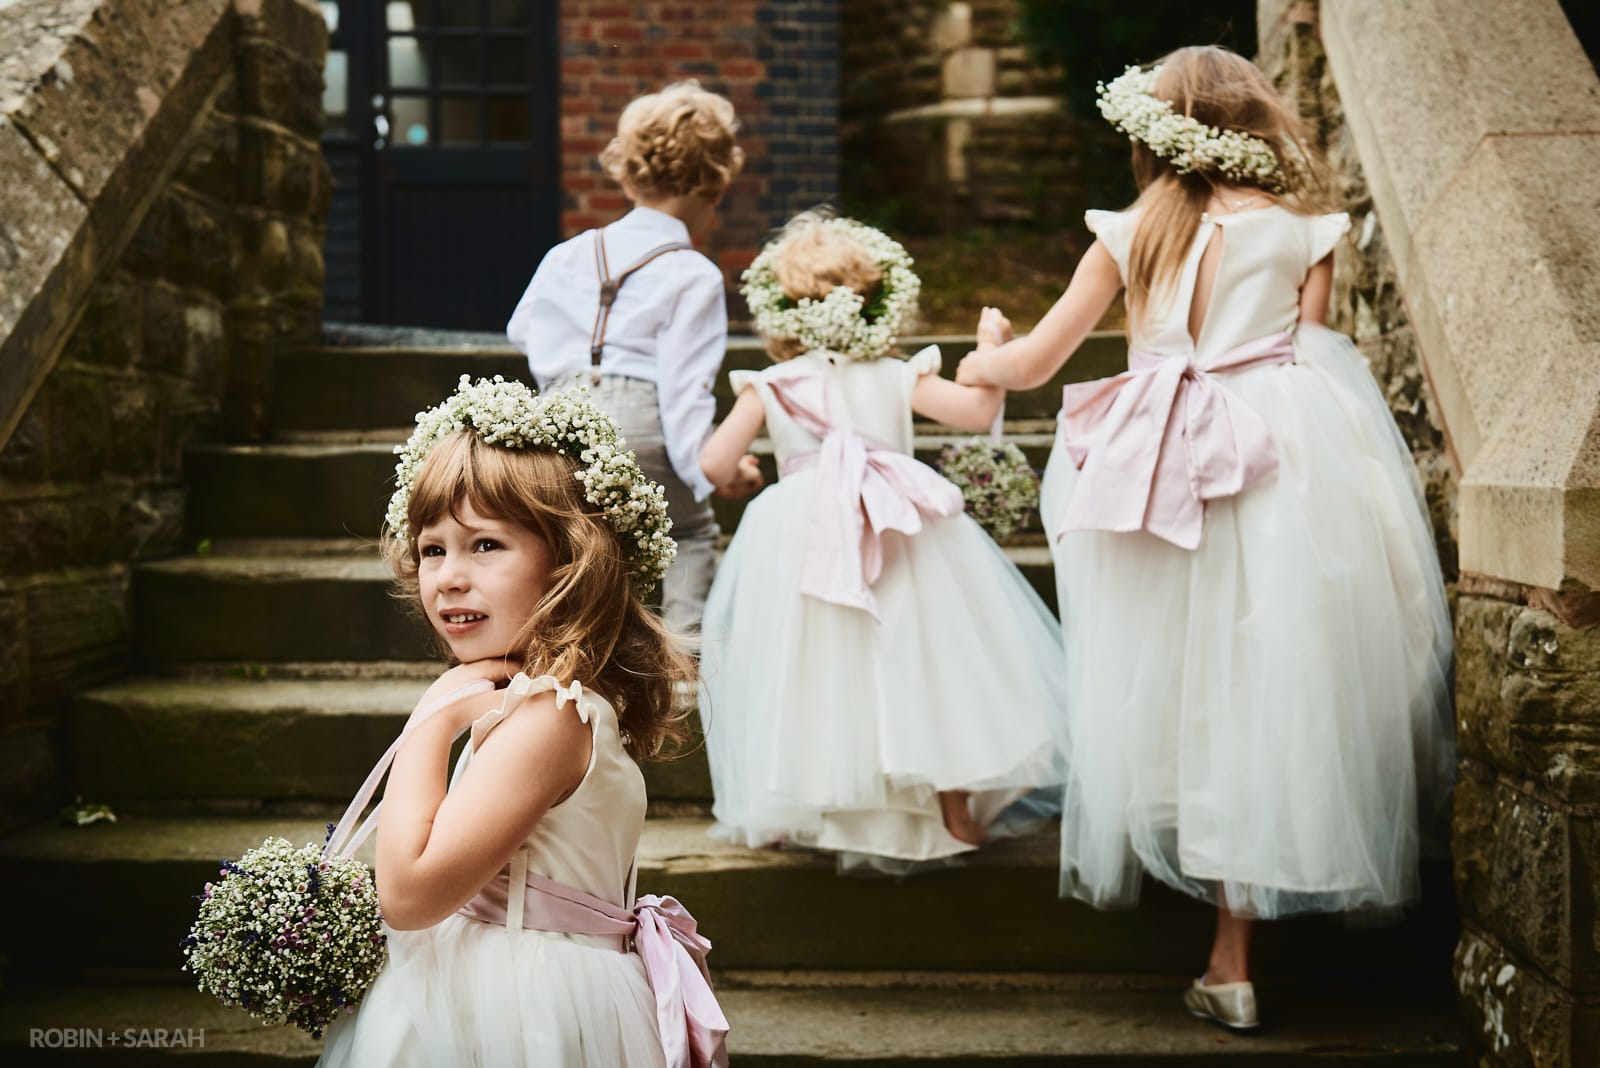 Flower girl pauses on steps before church wedding ceremony